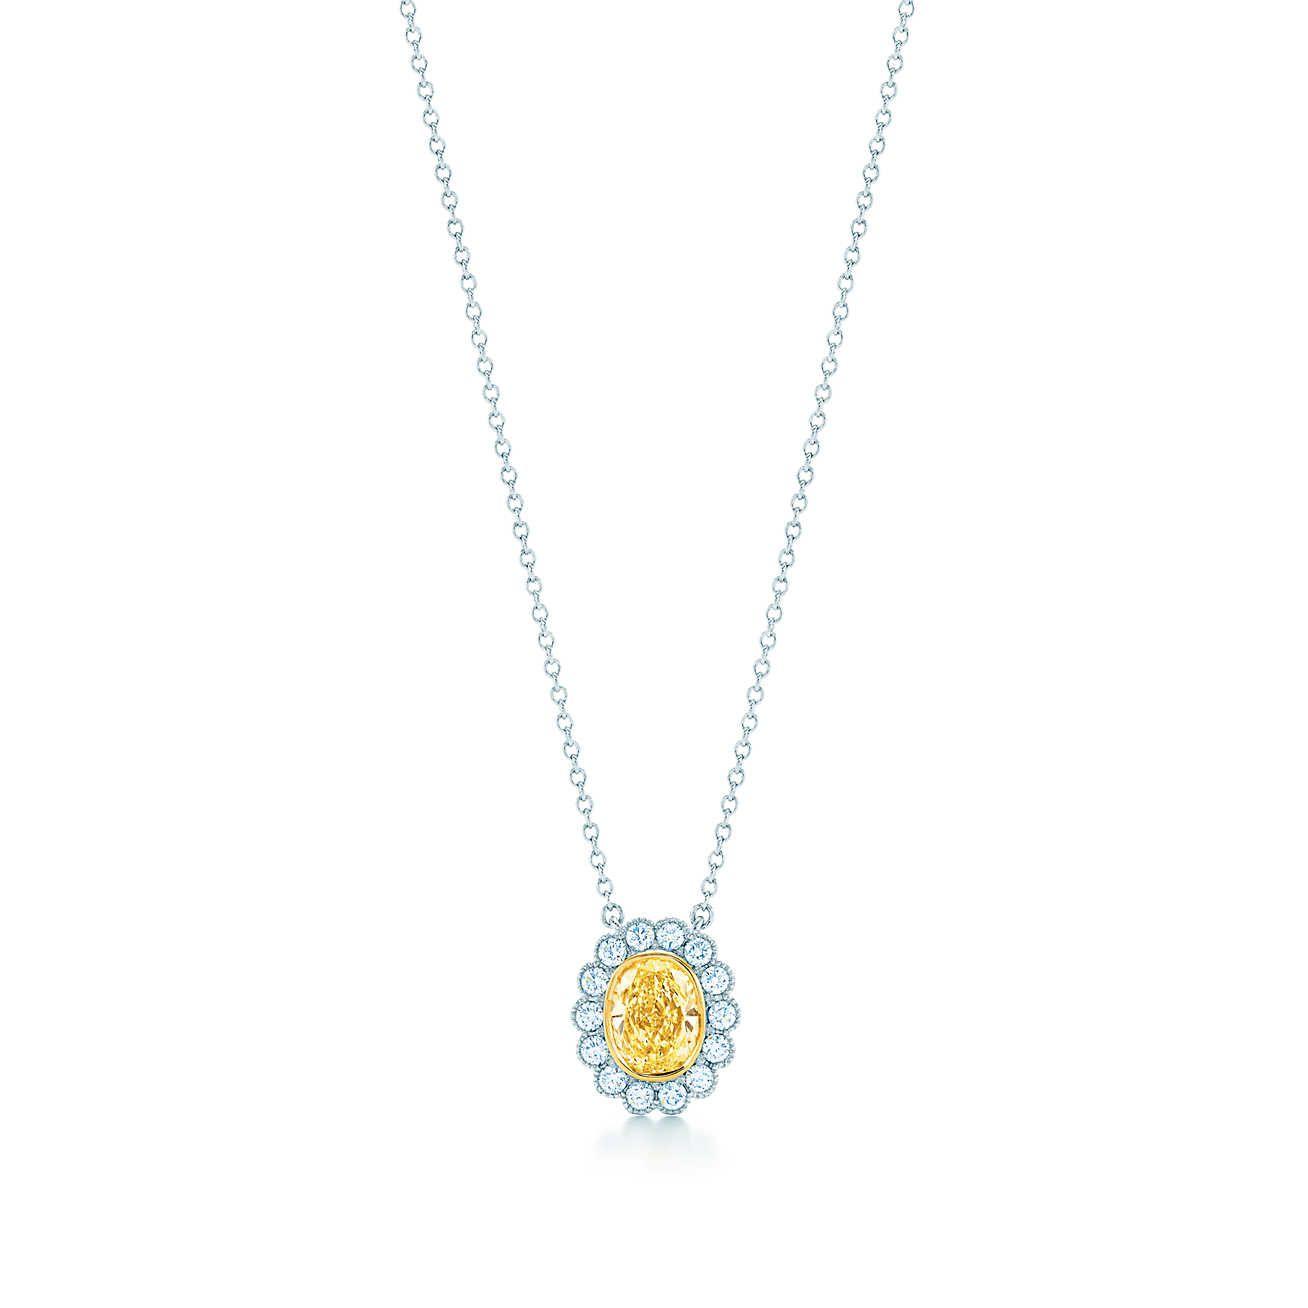 Tiffany enchantoval yellow diamond pendant diamond pendant tiffany enchantoval yellow diamond pendant aloadofball Gallery